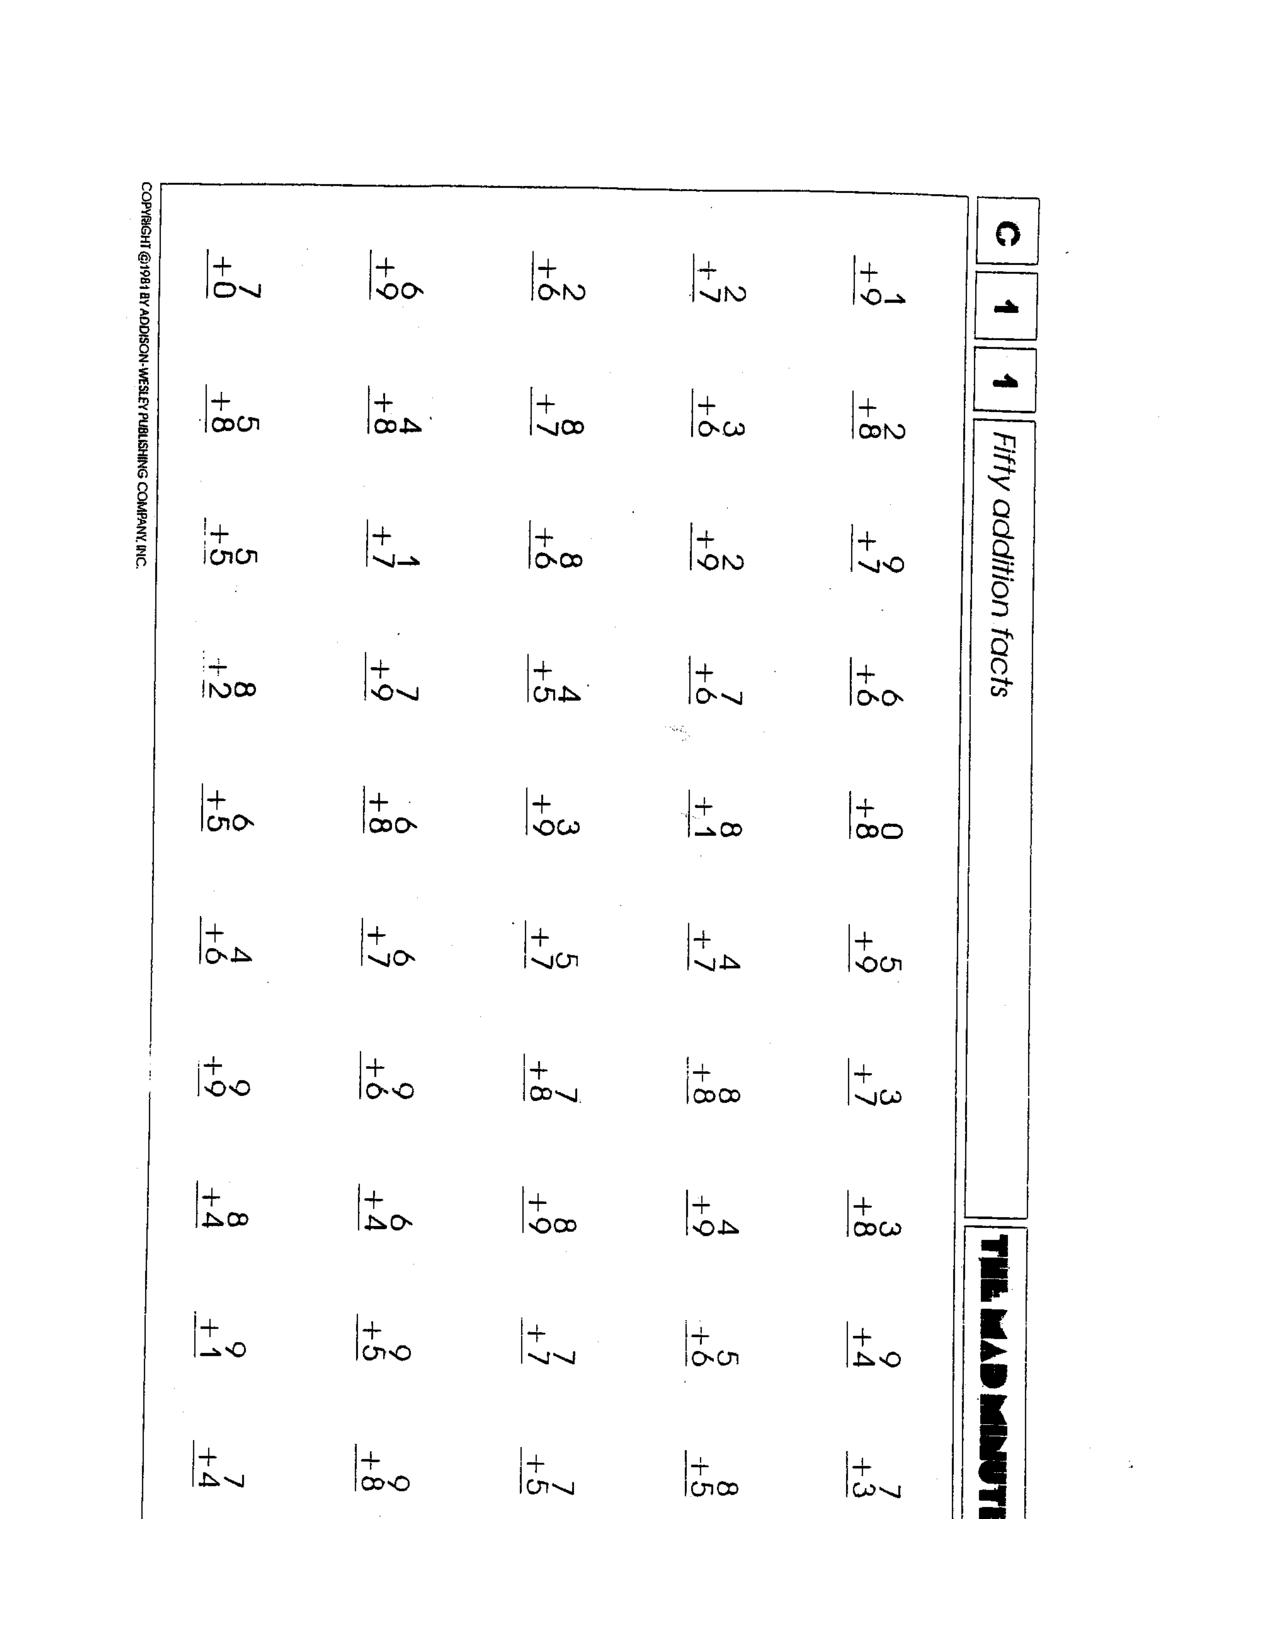 Printable Facing Math Worksheet 4th Grade